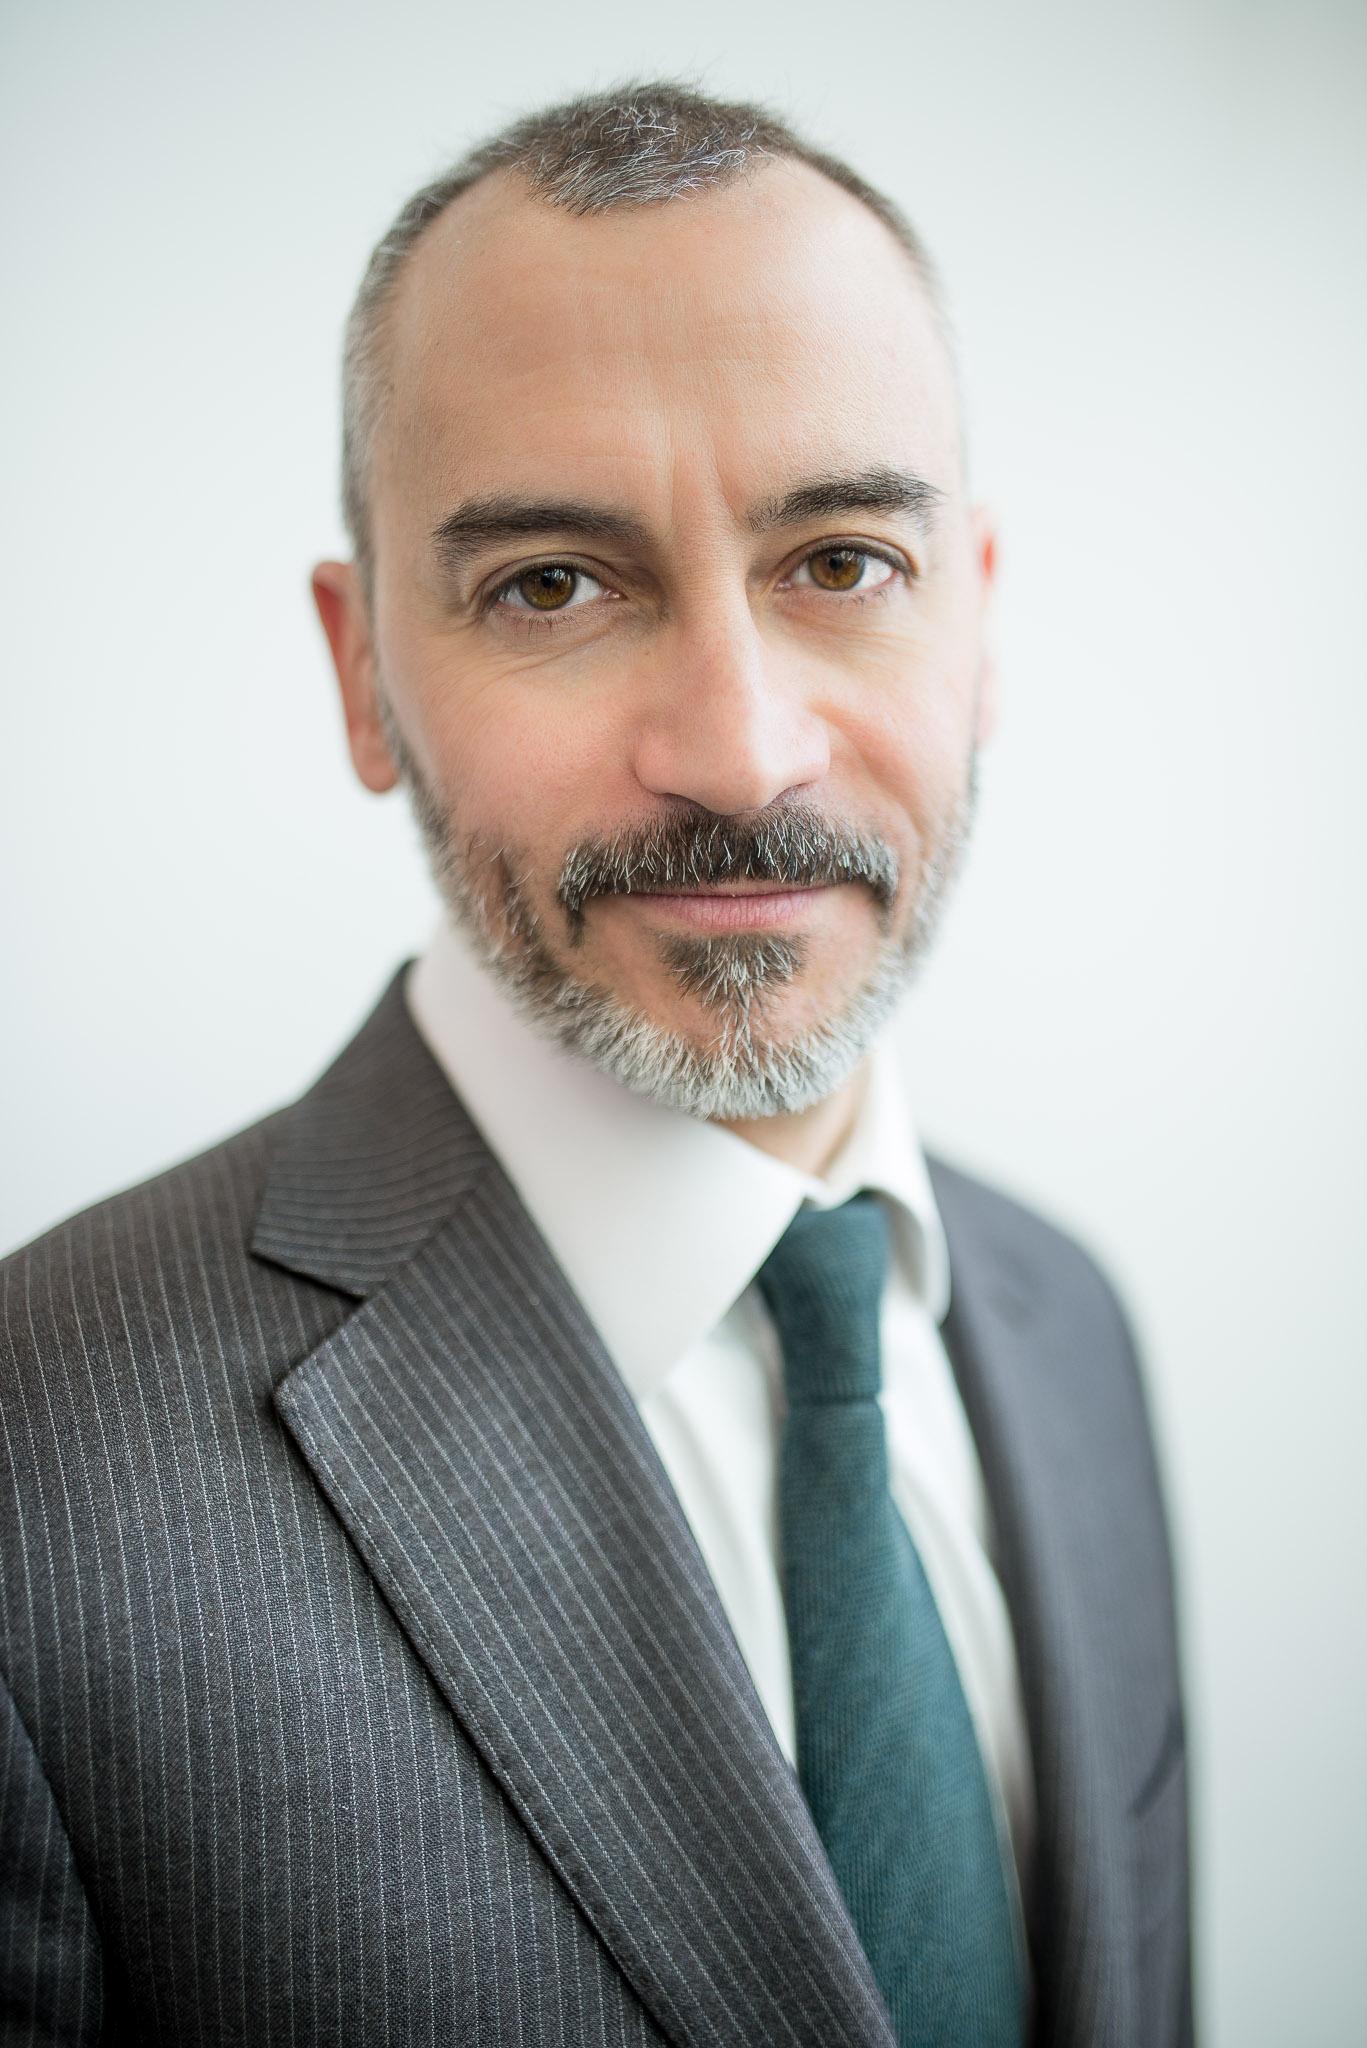 Professional Corporate & Business Headshot, Brighton & London Photographer